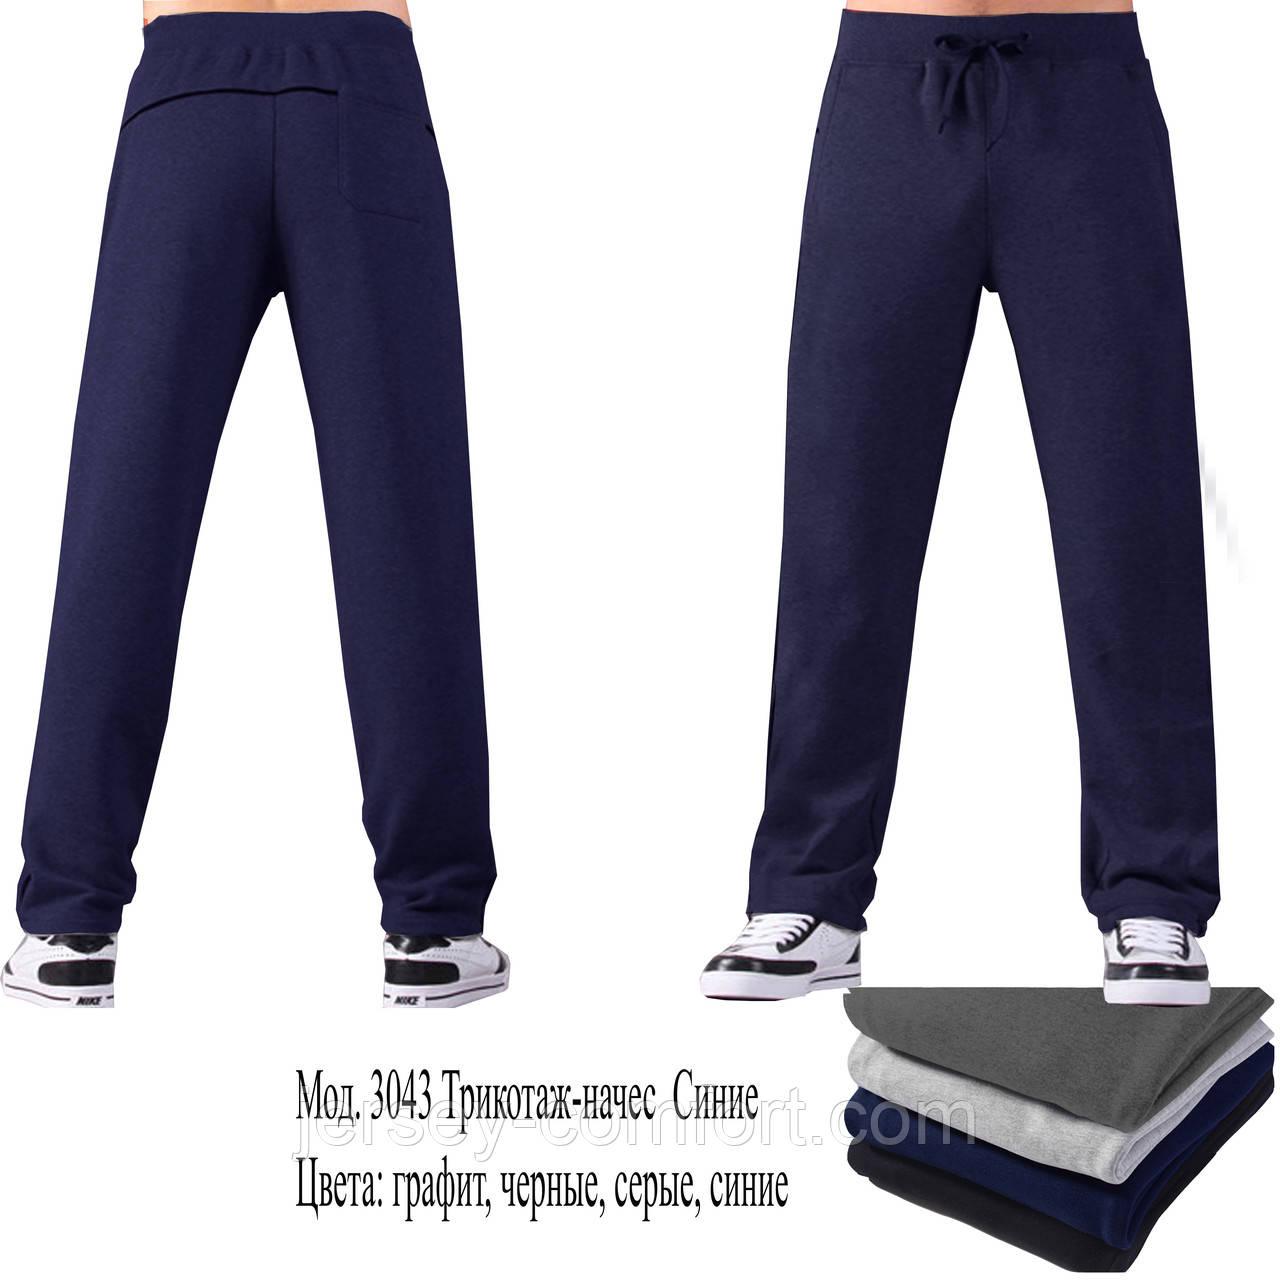 Теплые брюки, штаны мужские.Трикотаж начес.